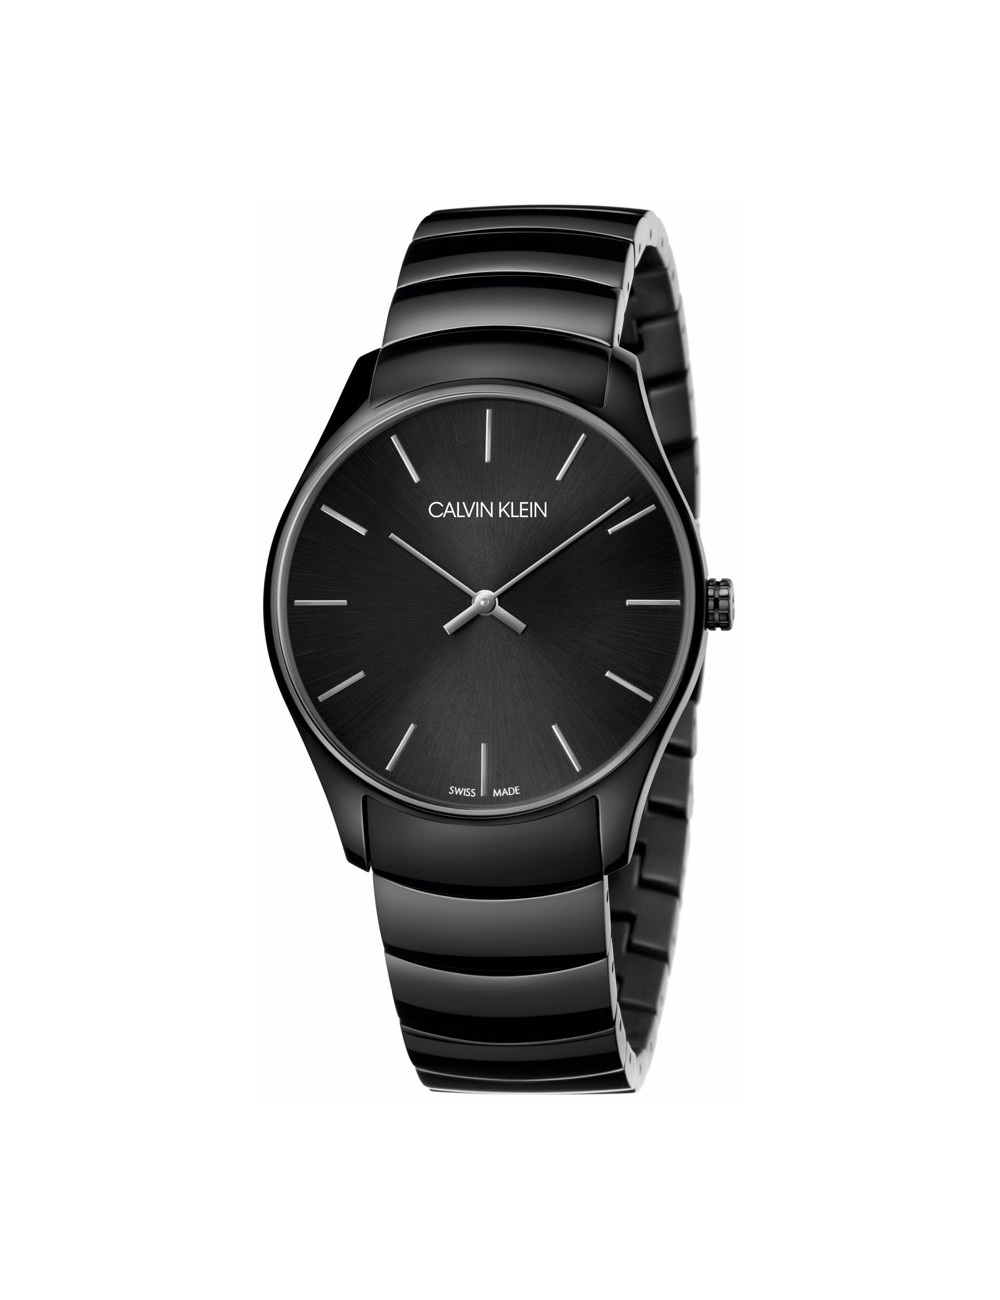 Calvin Klein Classic K4D21441 Mens Watch